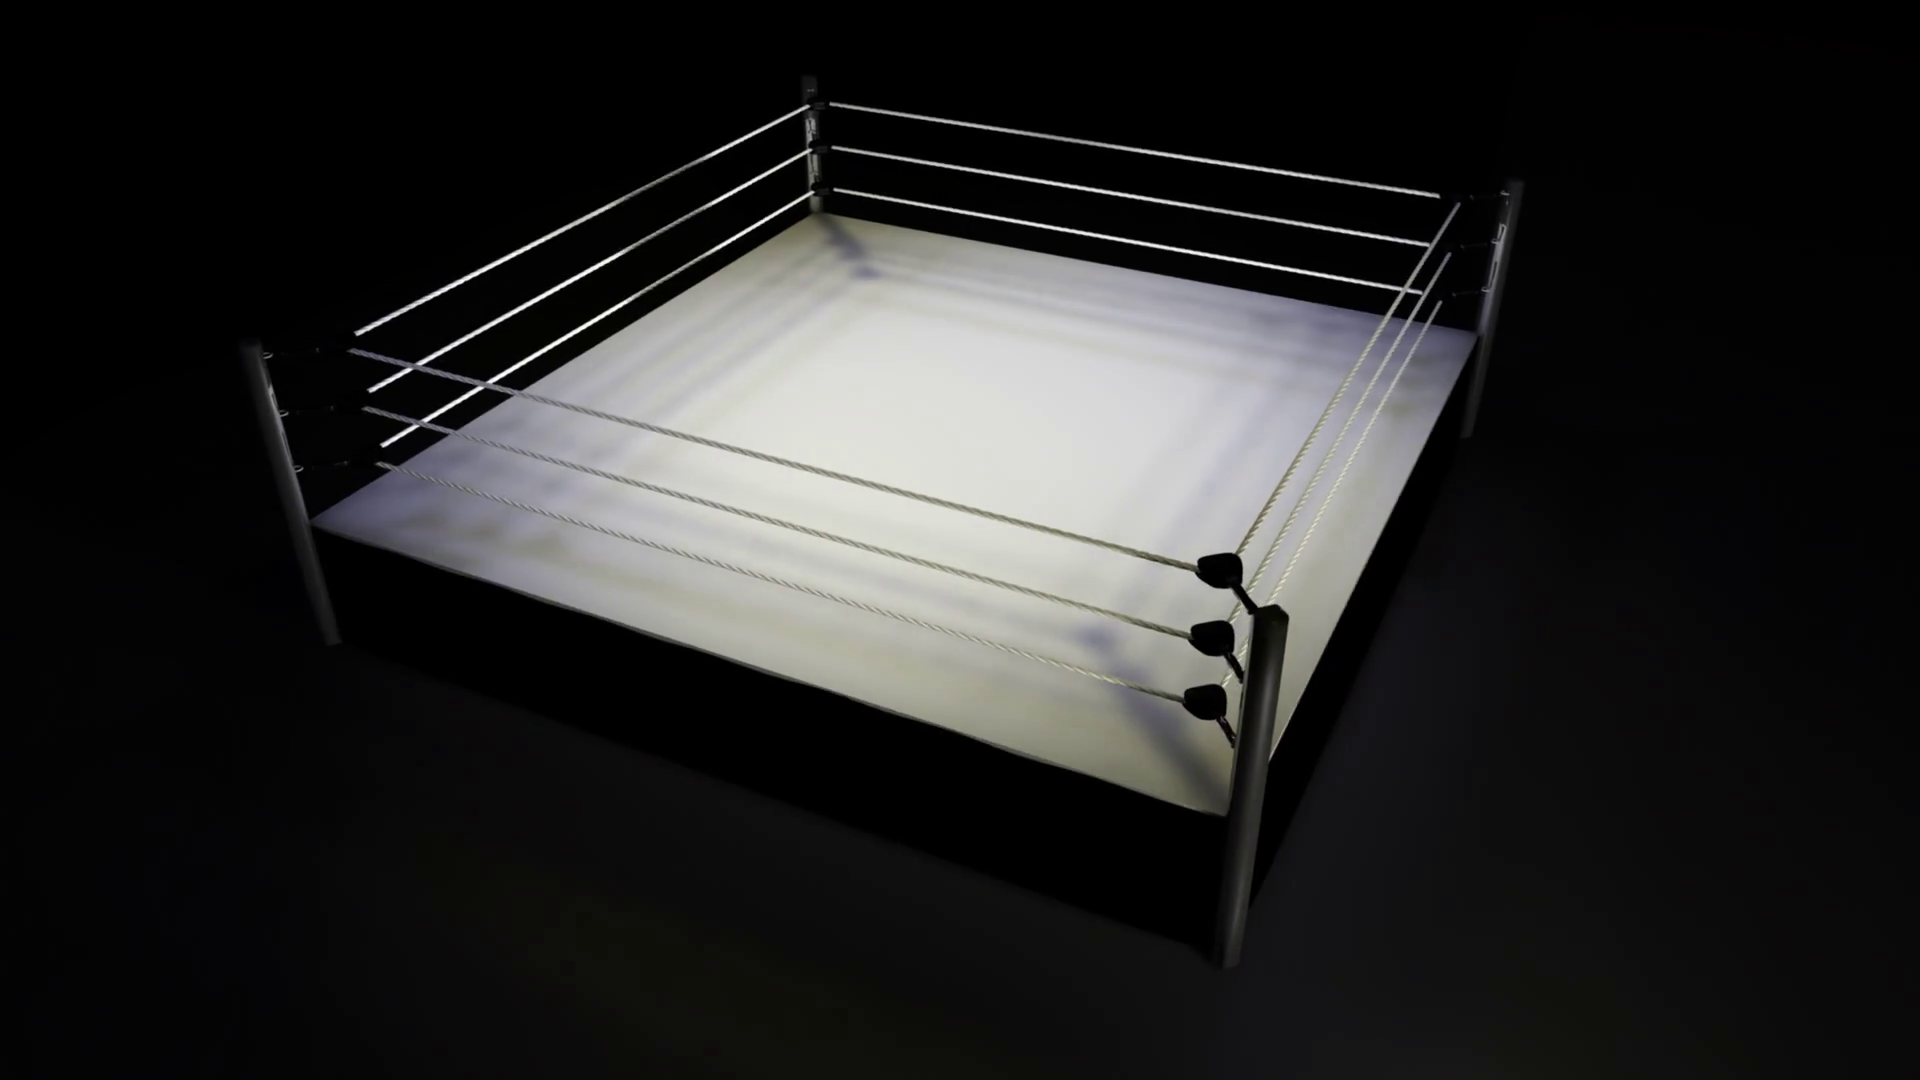 Rotating Boxing / Wrestling Ring on Black Background Motion ...